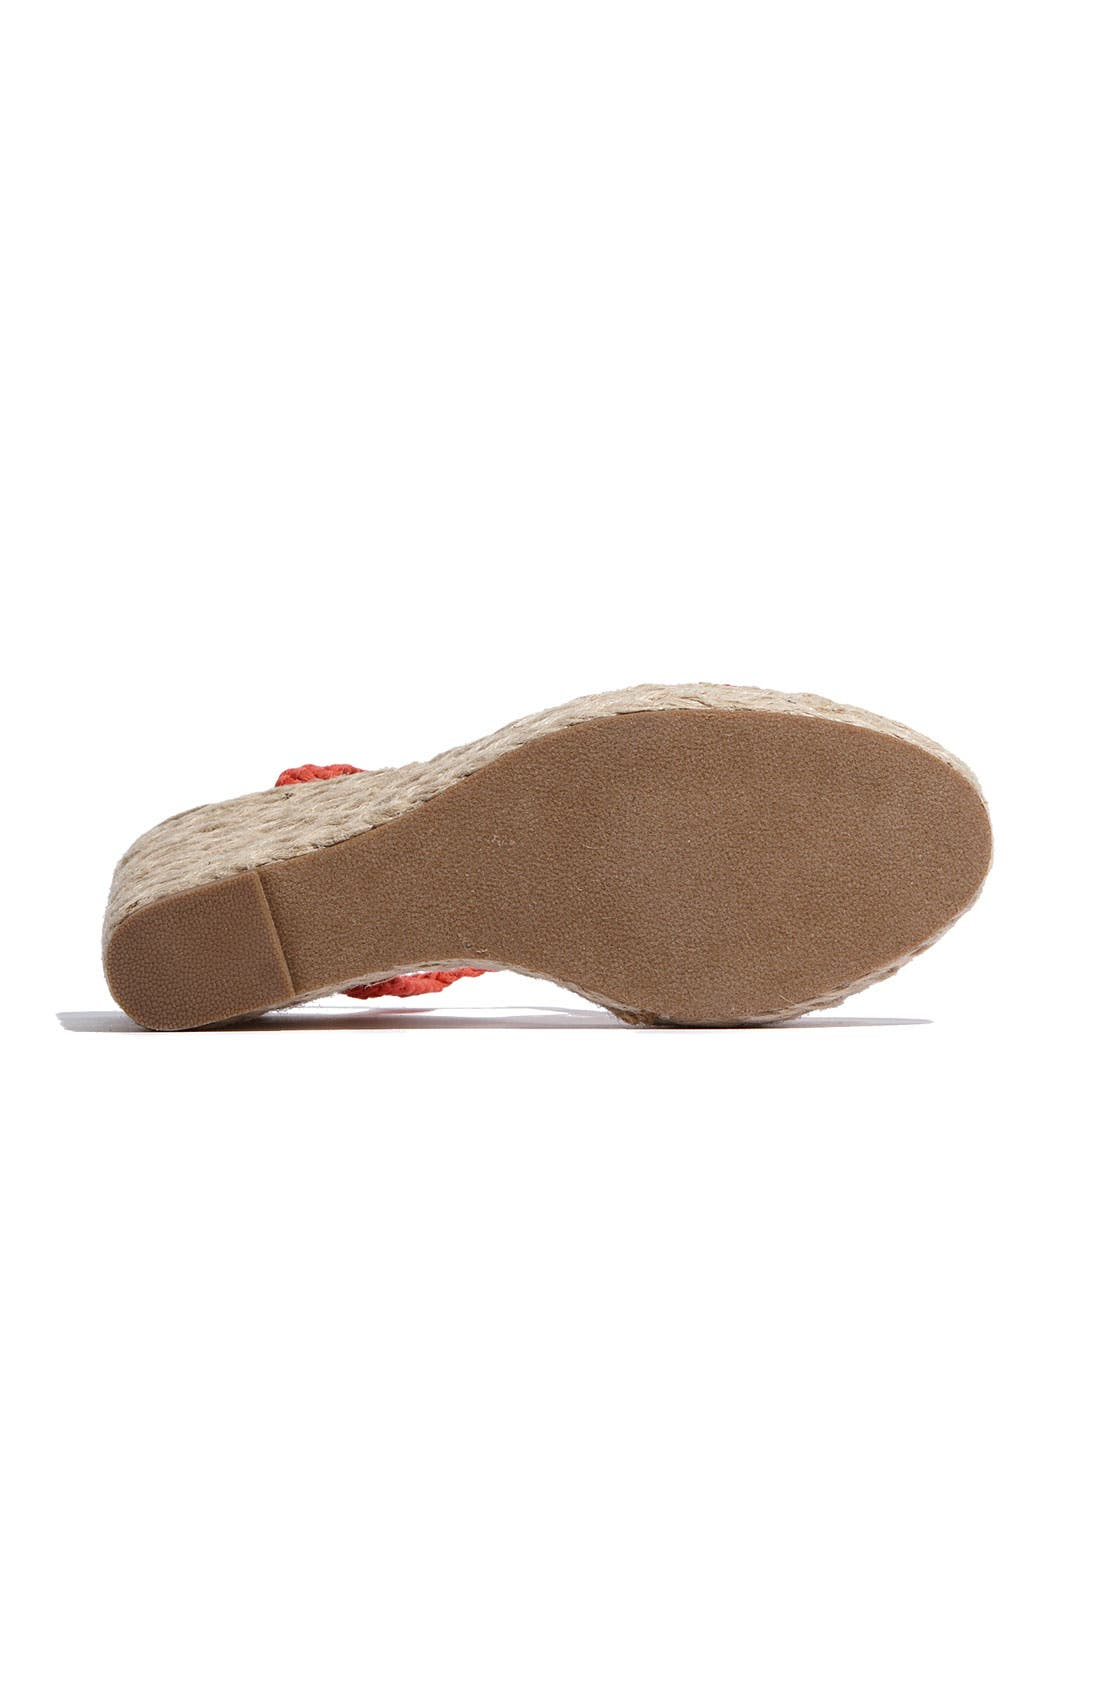 'Manngo' Woven Sandal,                             Alternate thumbnail 8, color,